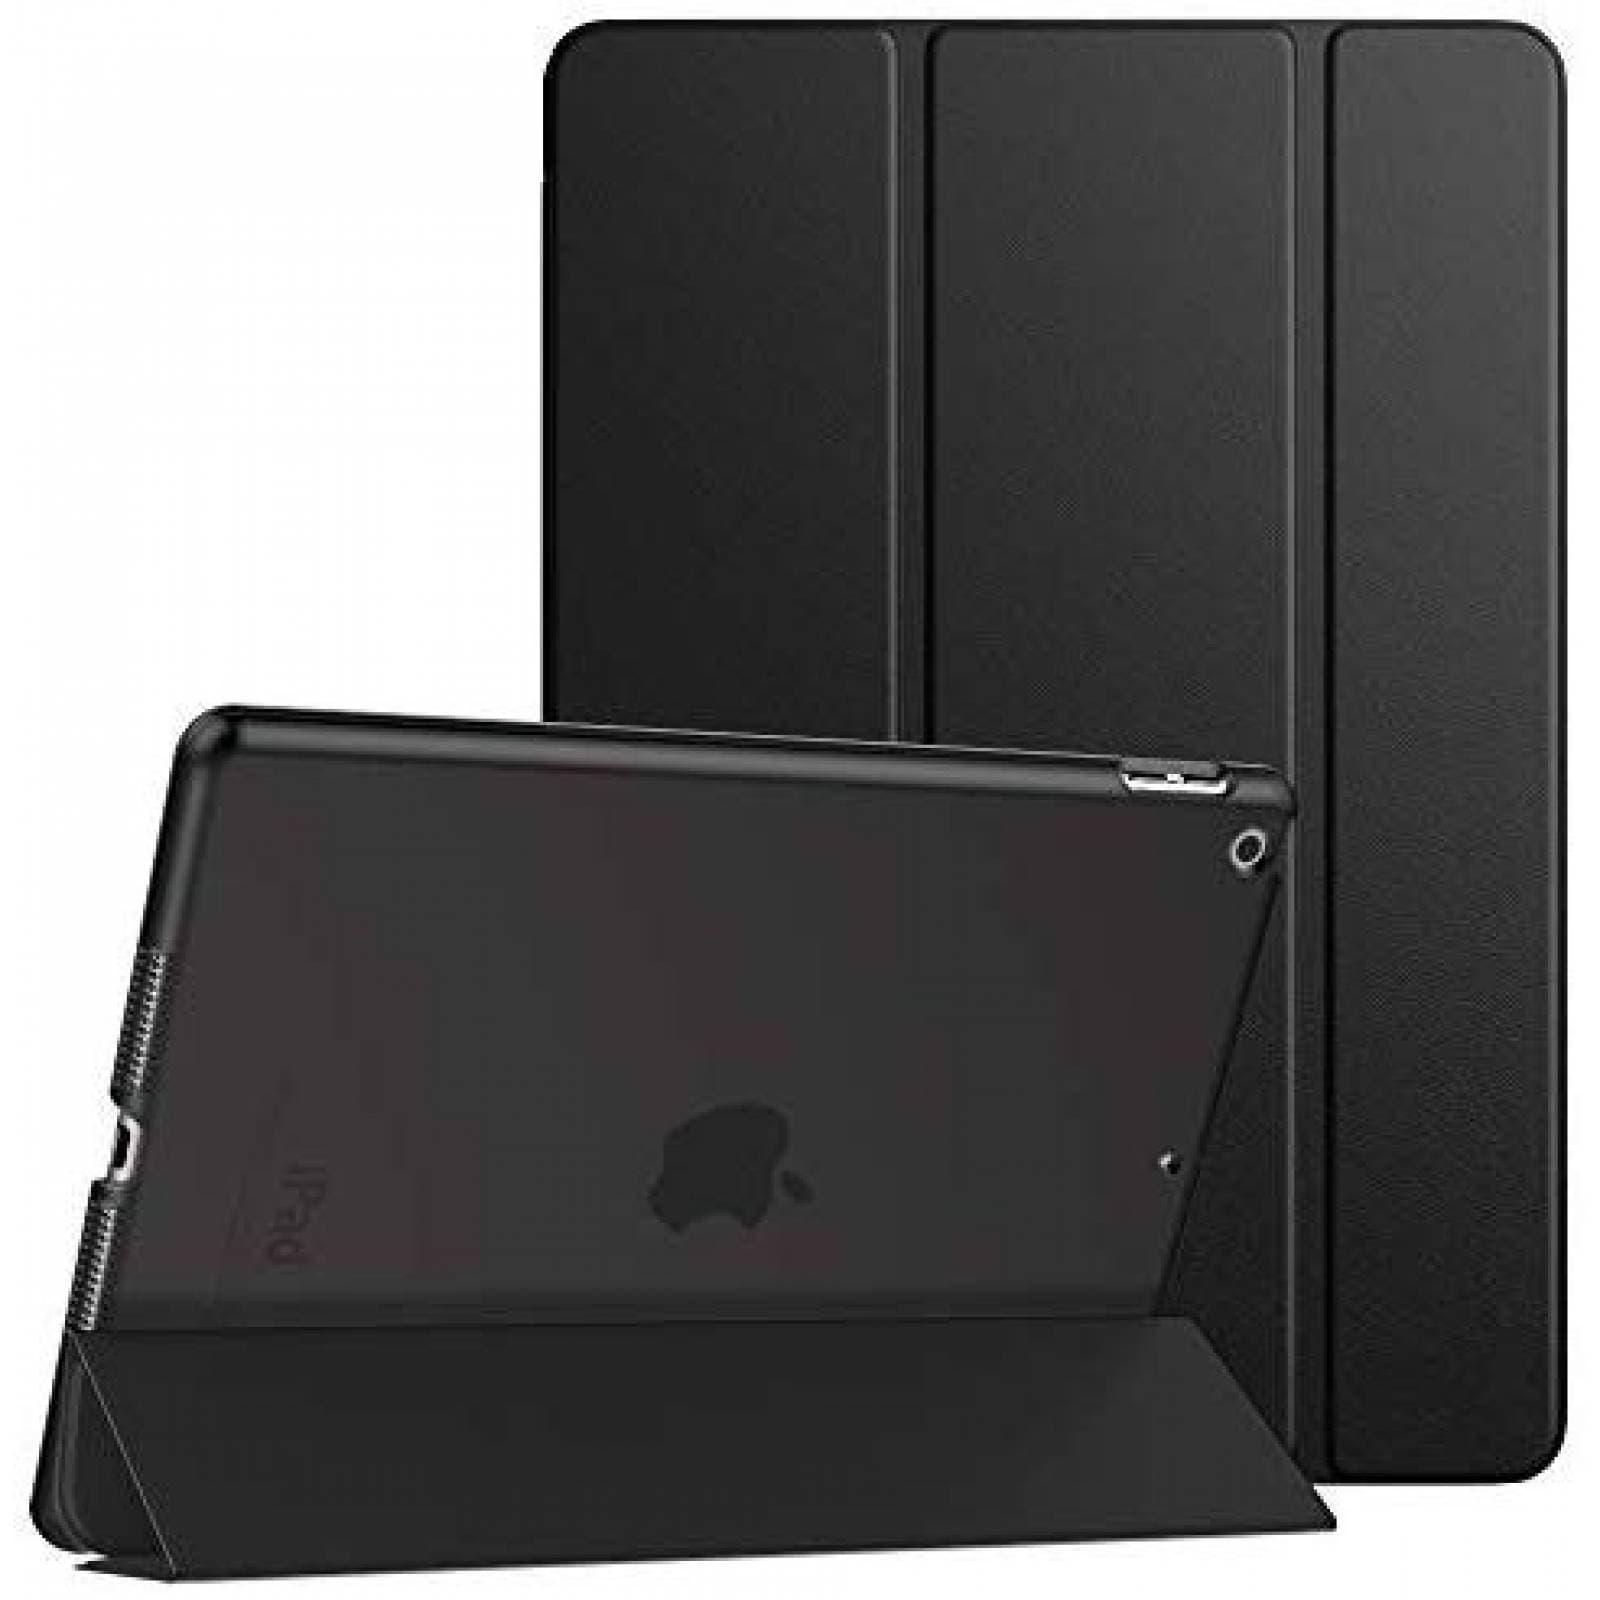 "Funda para tablet Dadanism para iPad 10.2"" 2019 -Negro"